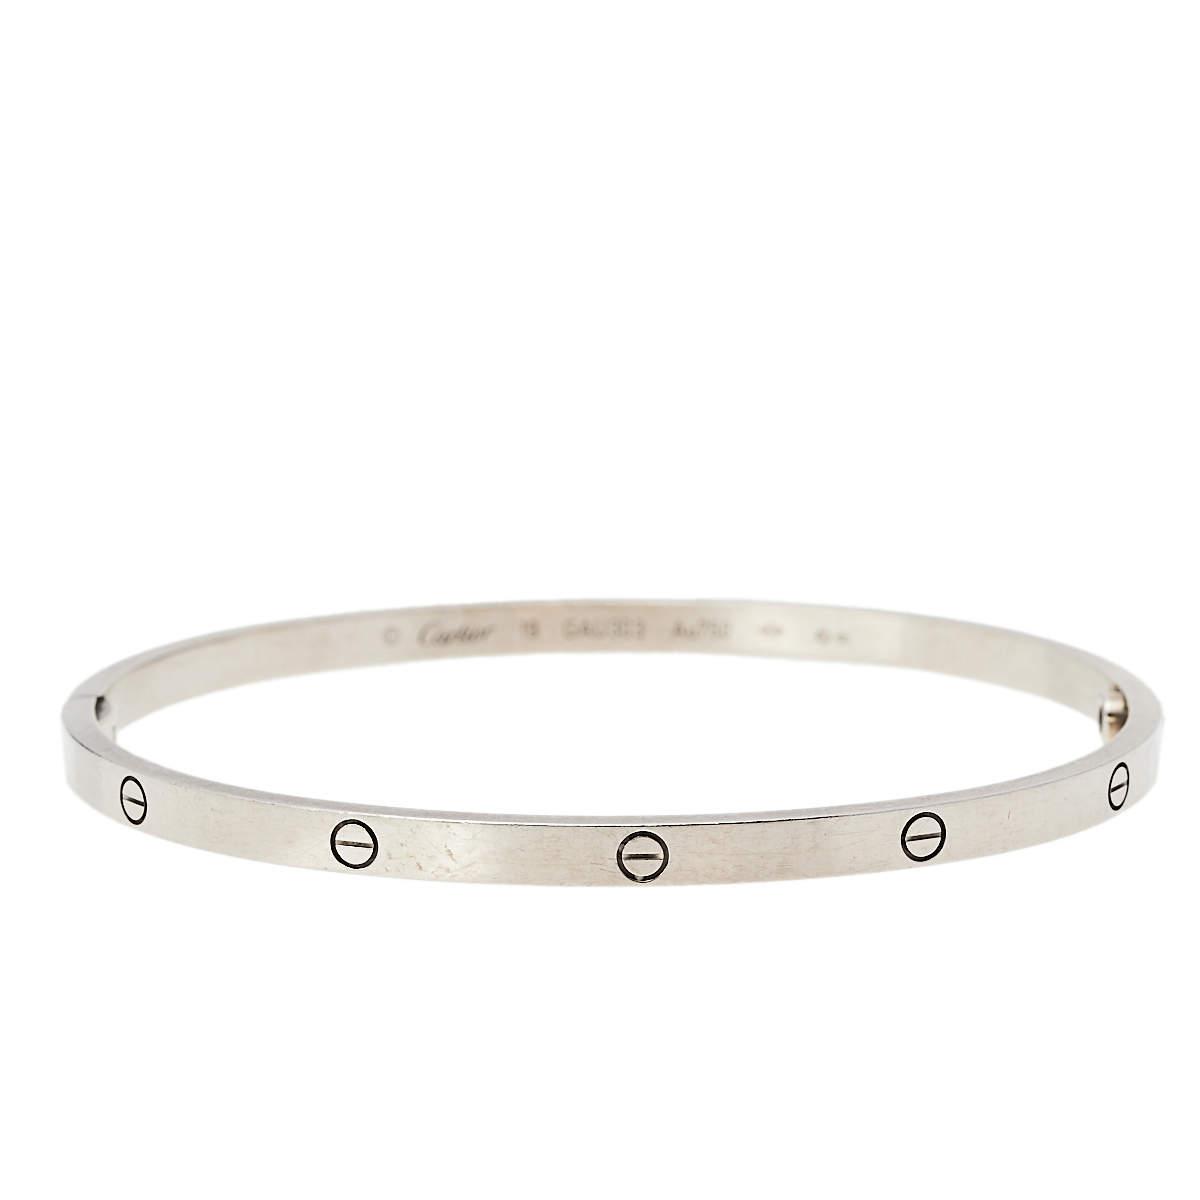 Cartier Love 18K White Gold Cuff Bracelet 19